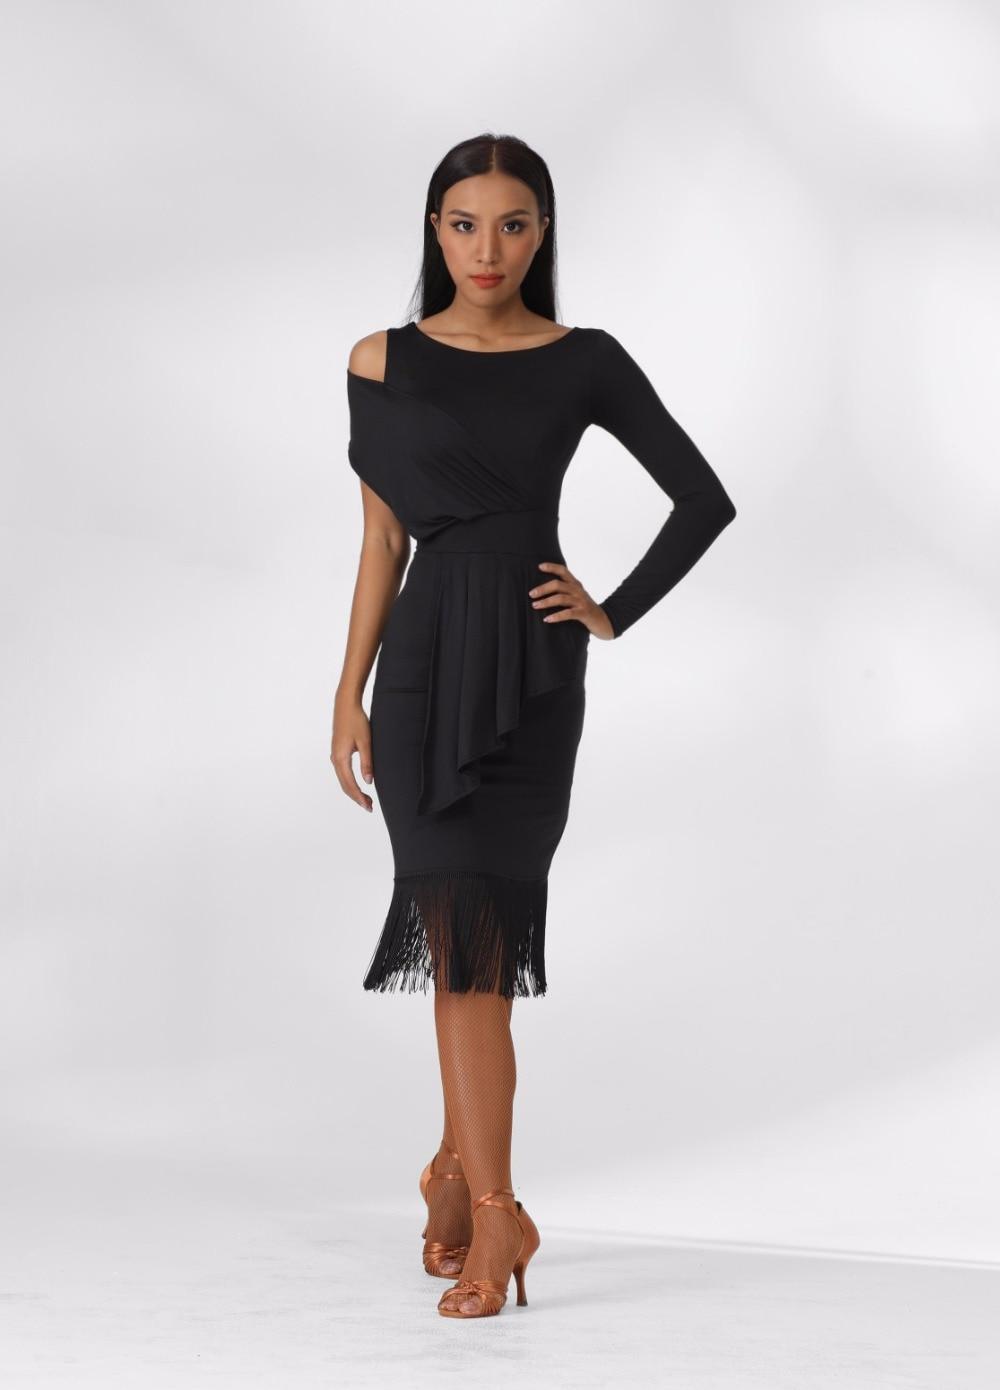 a7a9bcfa347d1 ZYM dance style latin practice wear, tassel dress ZYM1781-in Latin ...